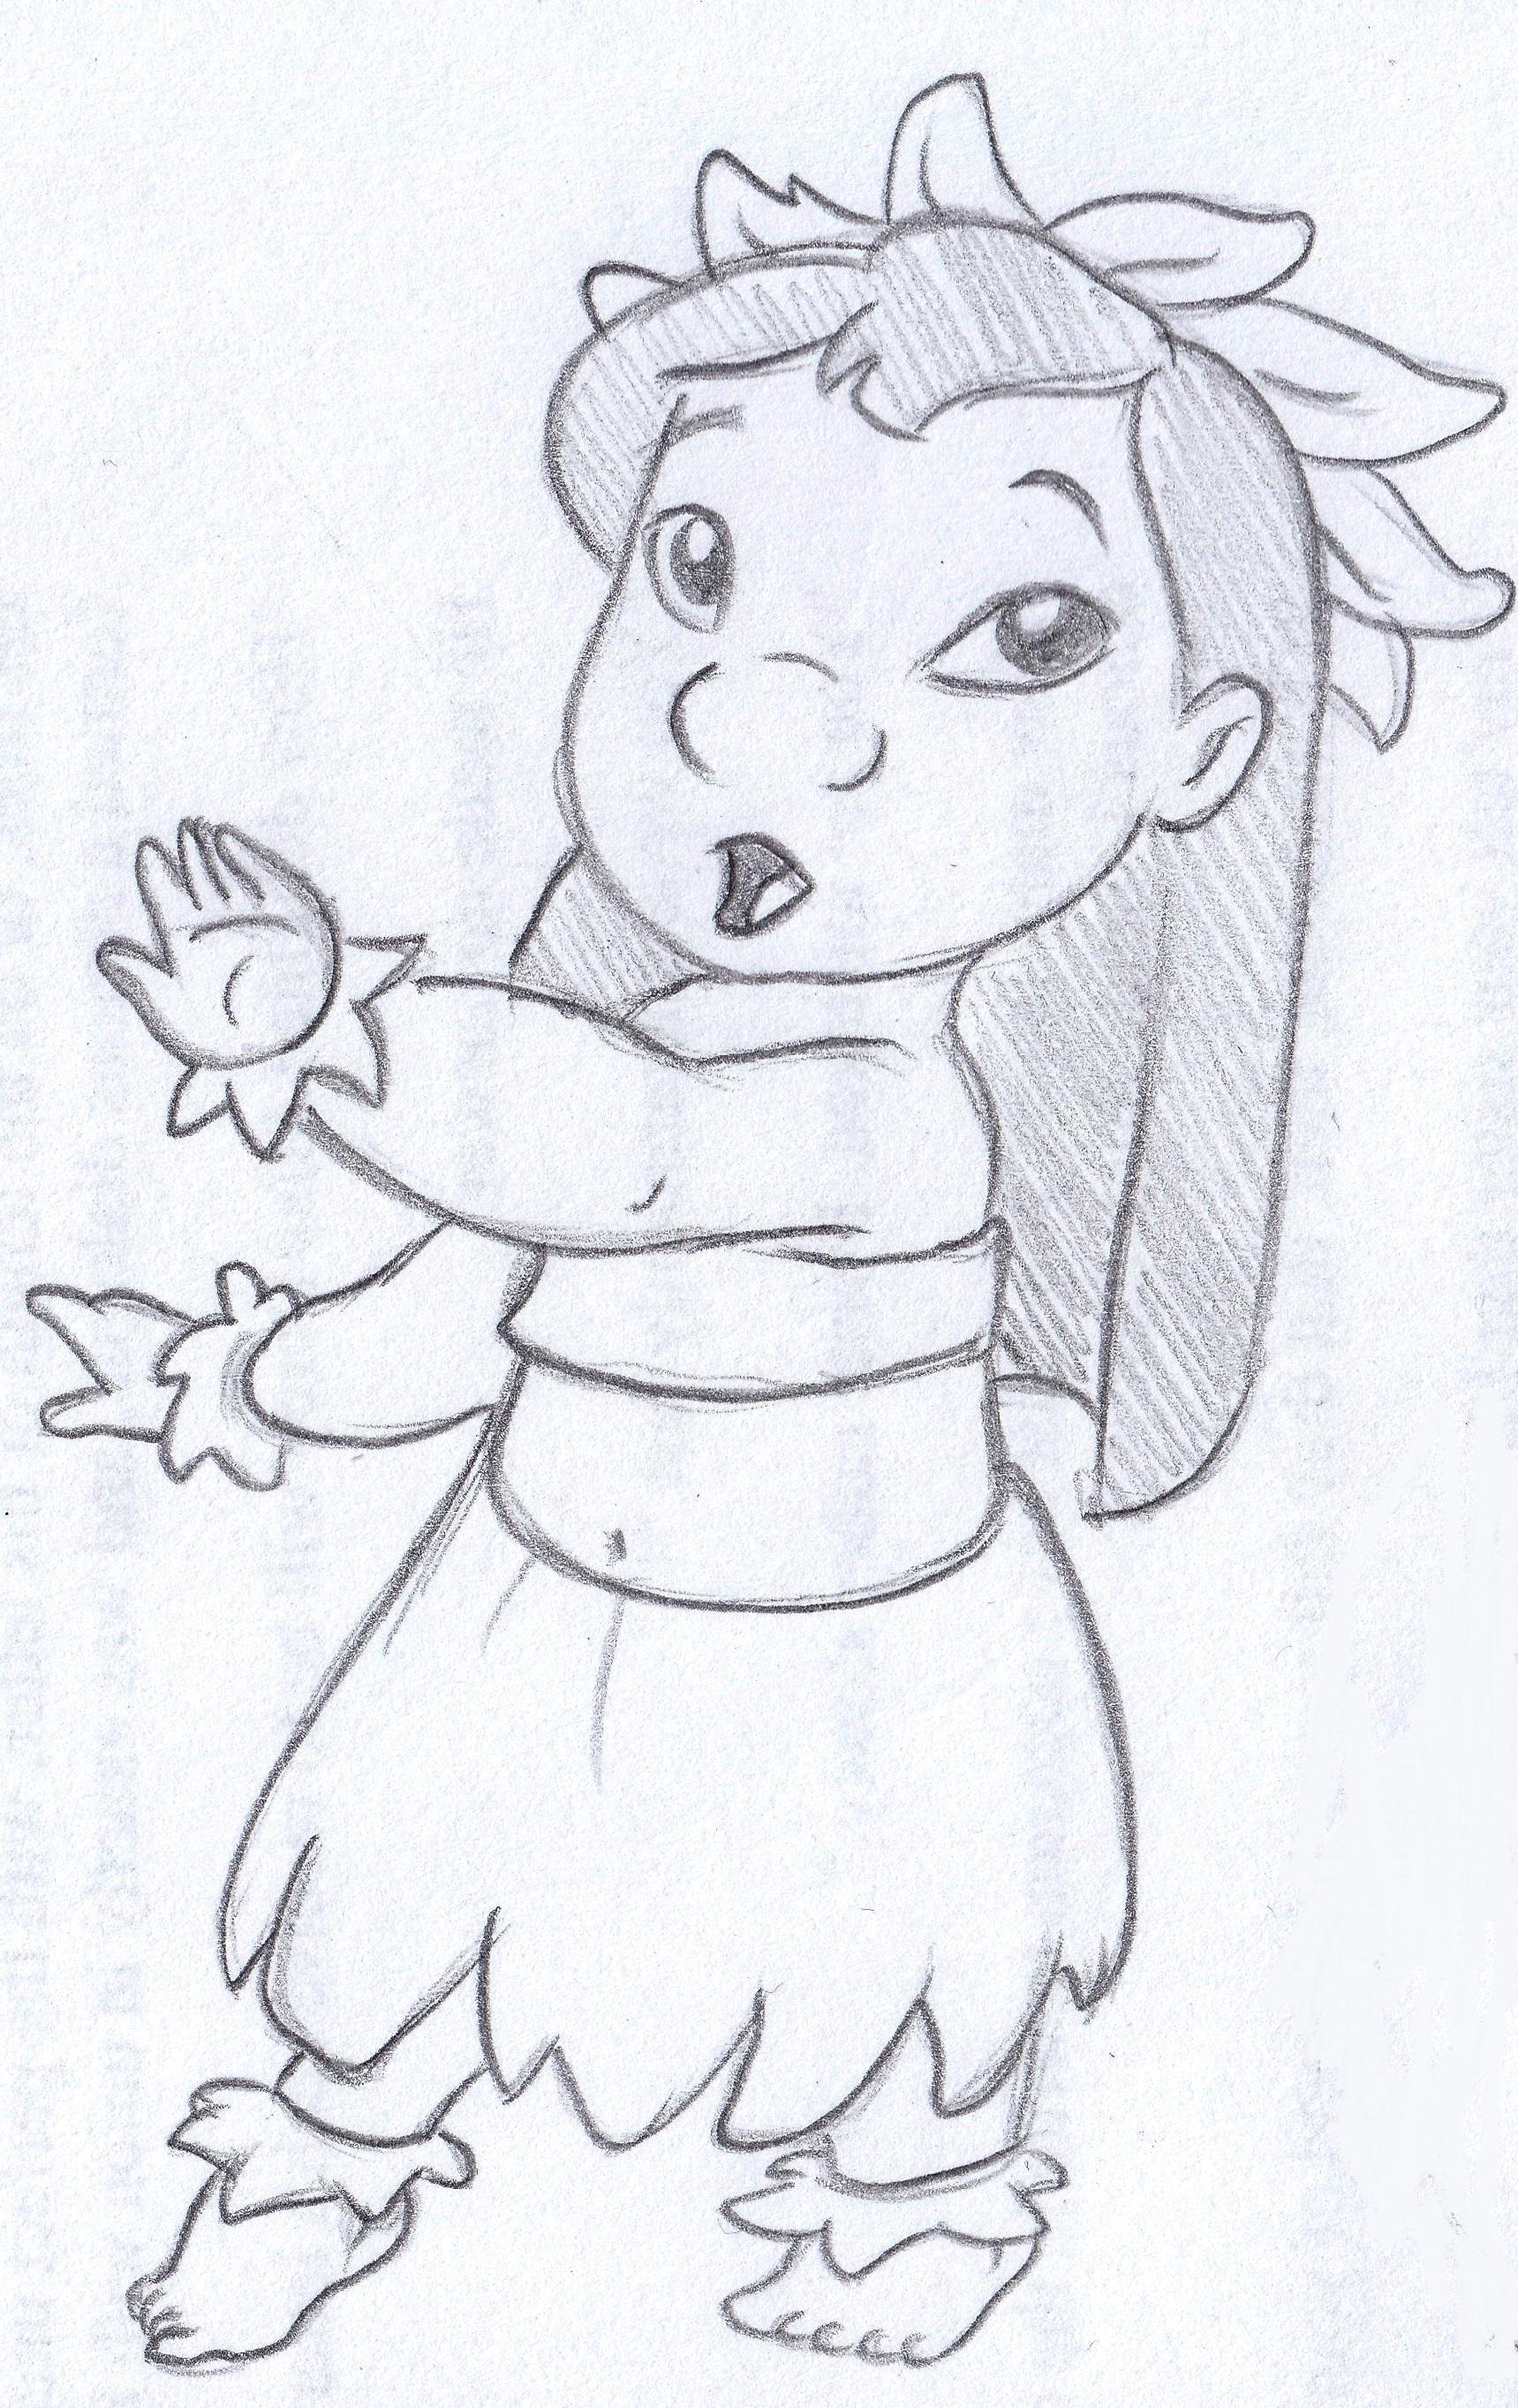 Drawn pencil lilo and stitch Helena by Art sketch Anna